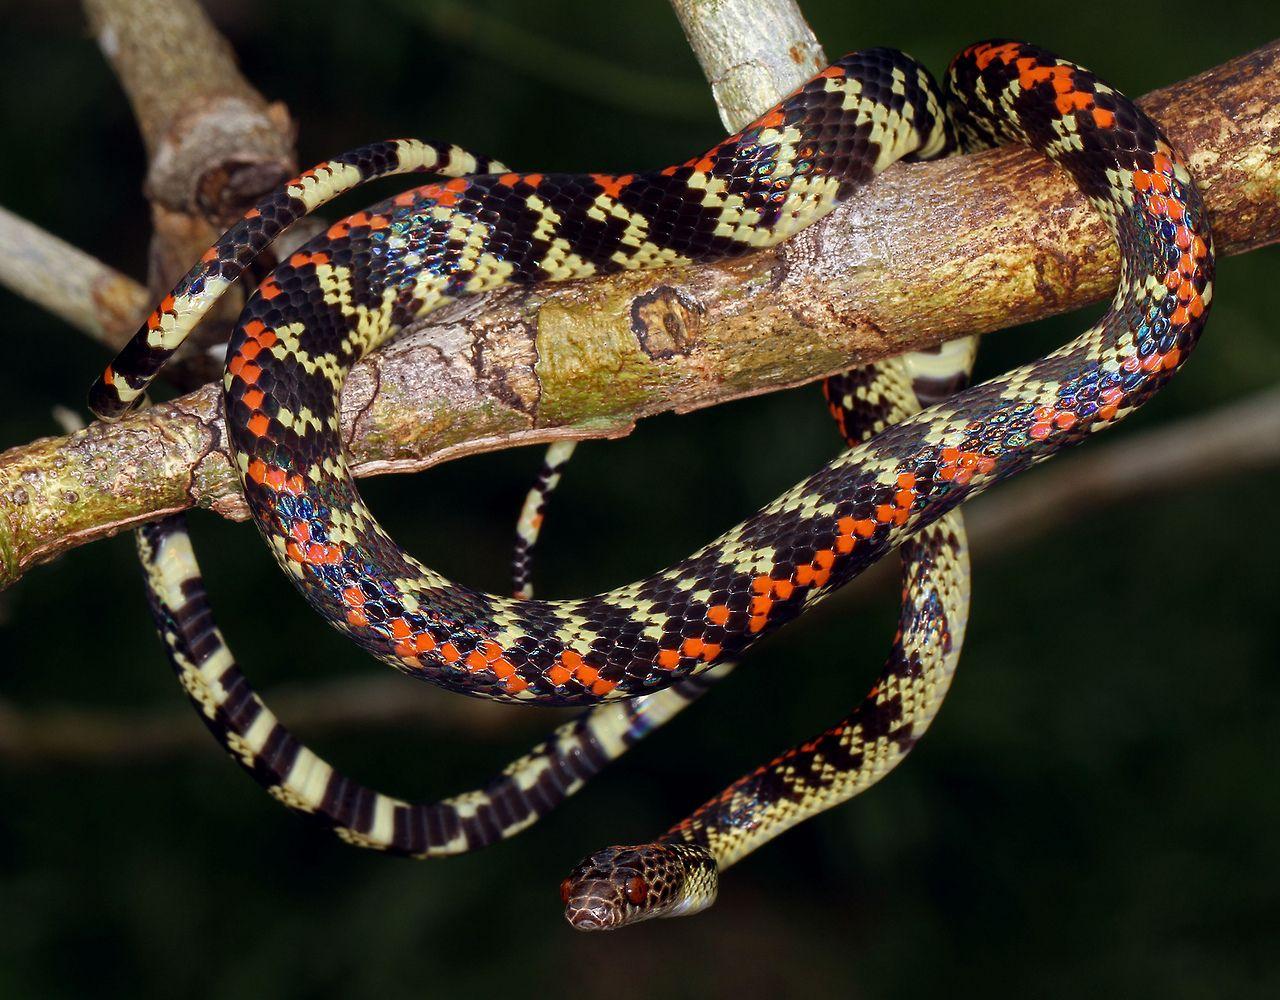 Liana Snake (Siphlophus cervinus) by cowyeow Snake